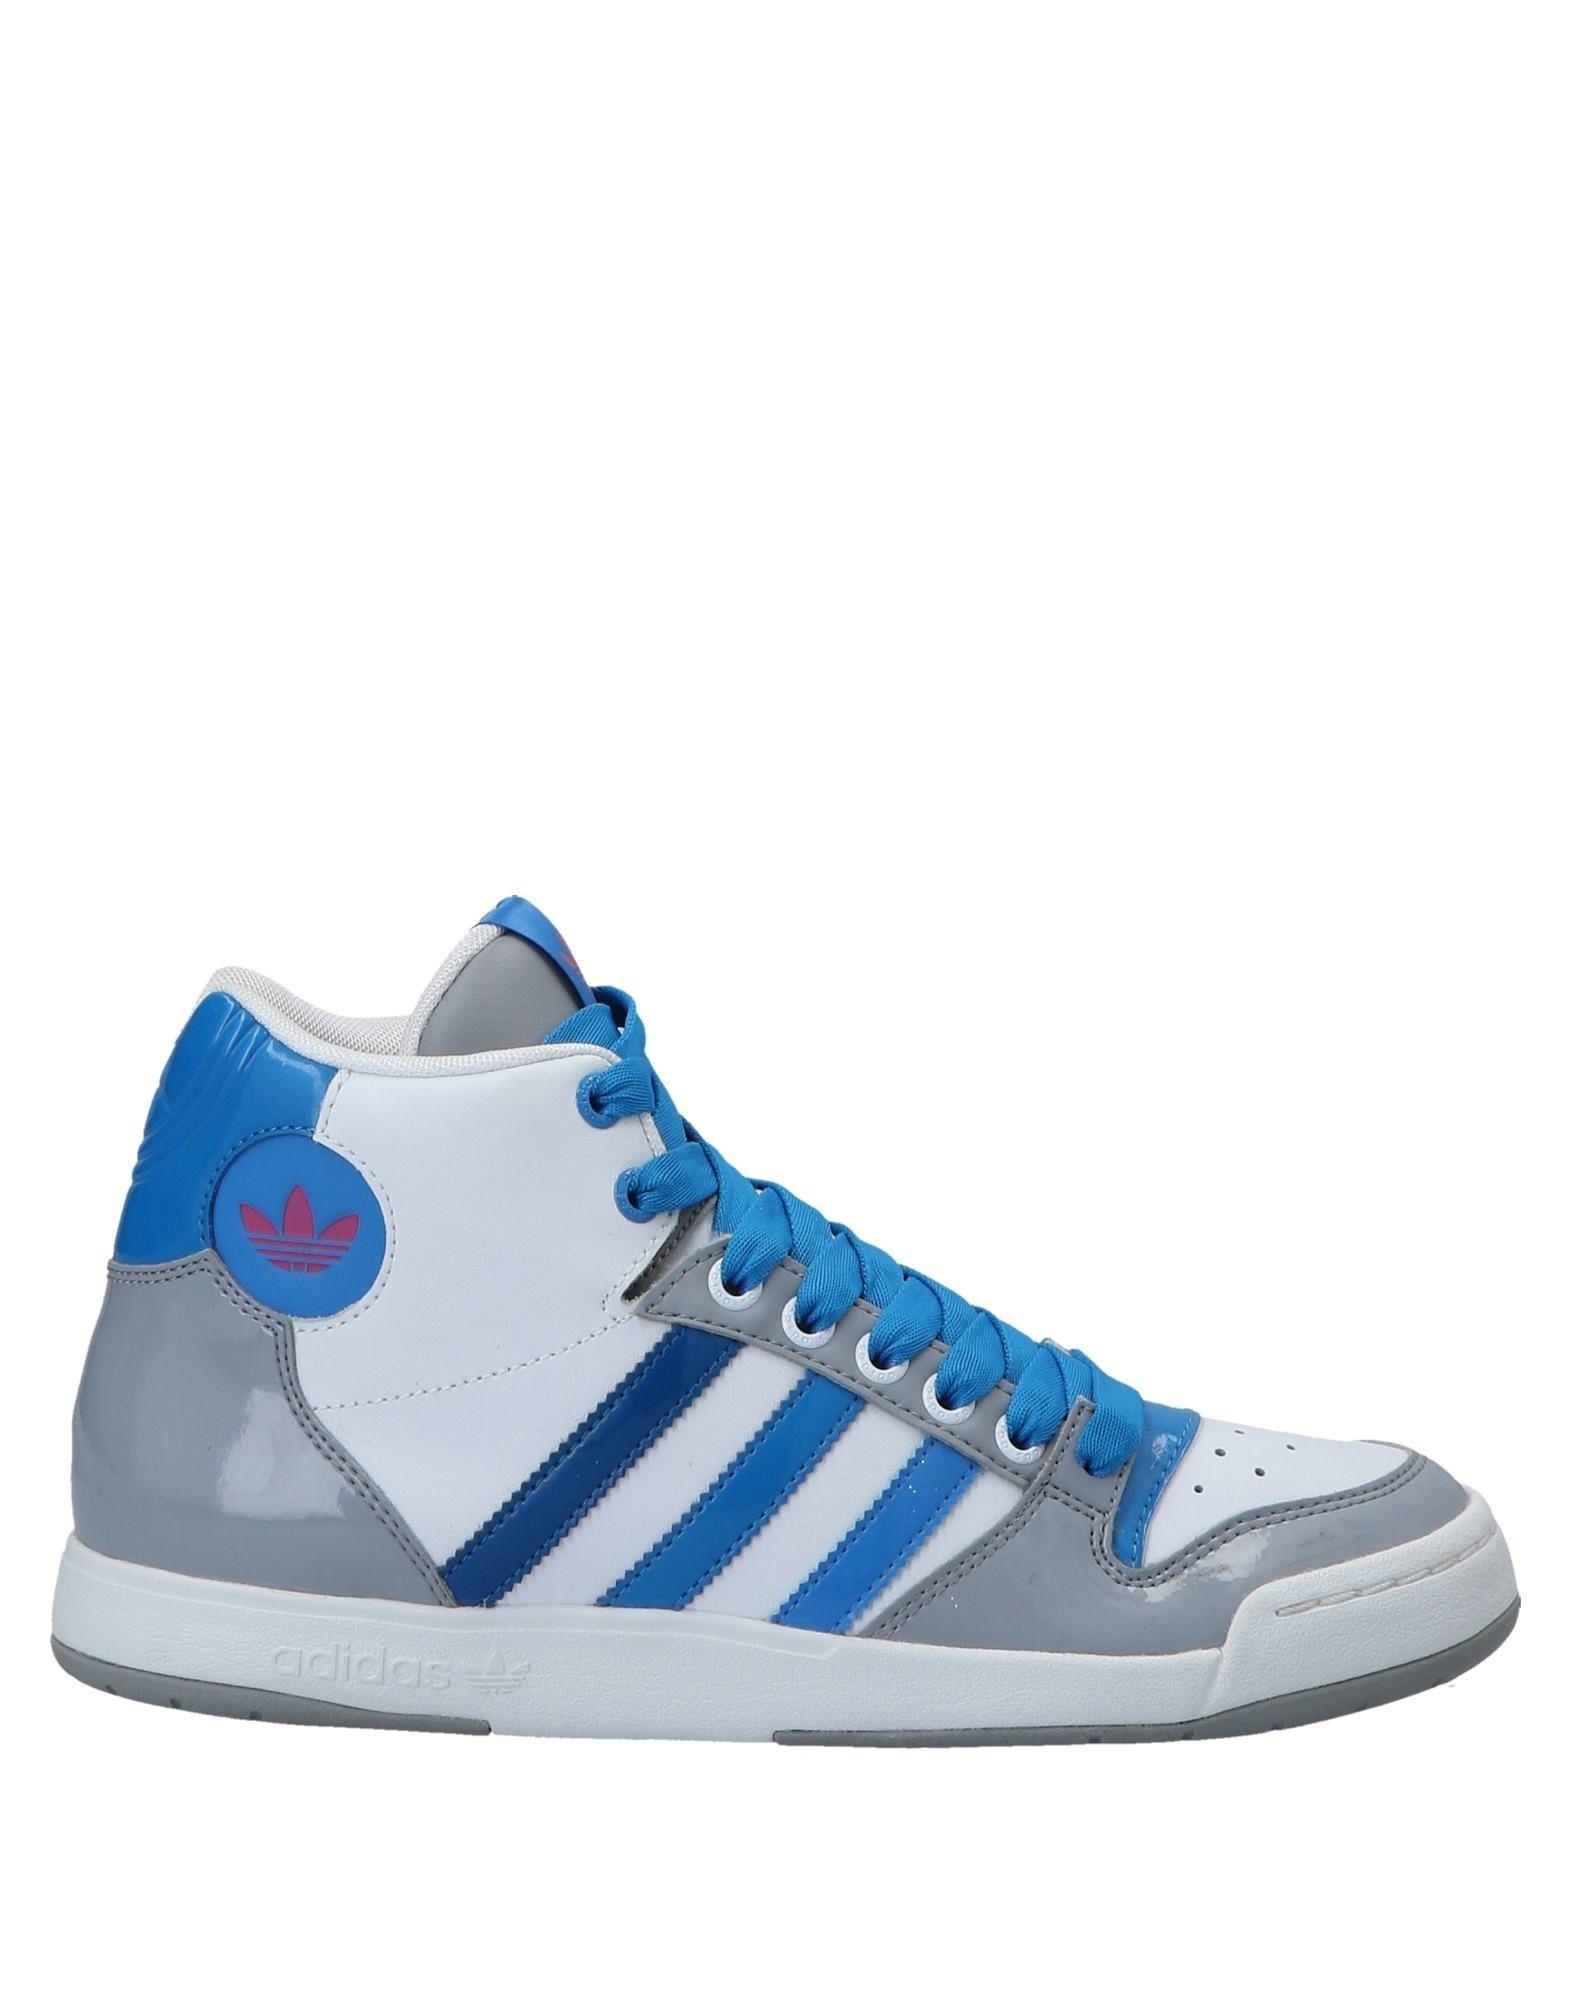 Adidas Originals Sneakers - online Women Adidas Originals Sneakers online - on  Australia - 11554447FH 44f5d9